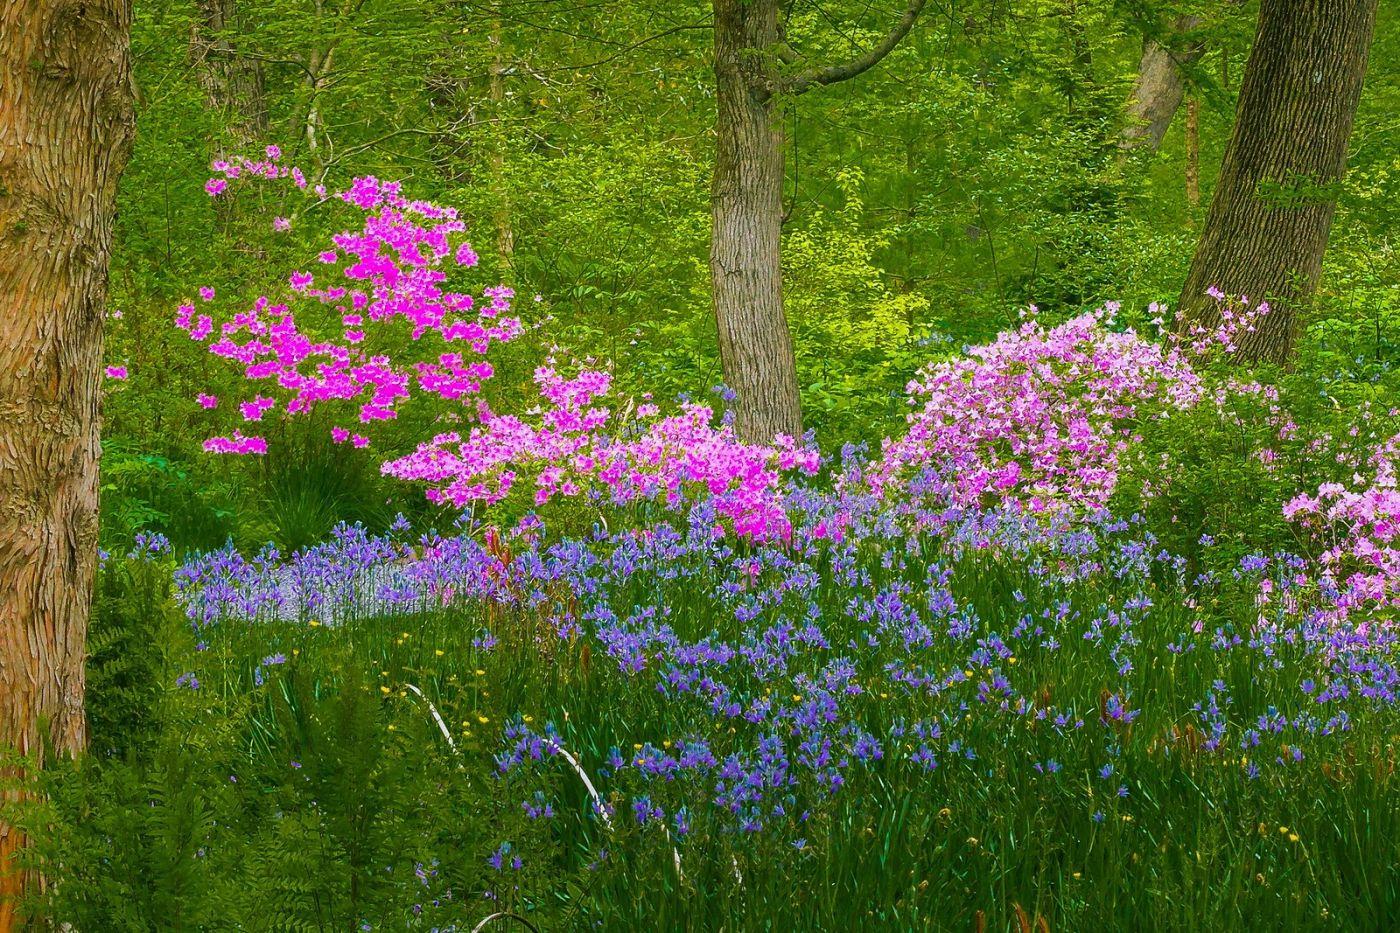 Chanticleer花园,有梦想的季节_图1-40